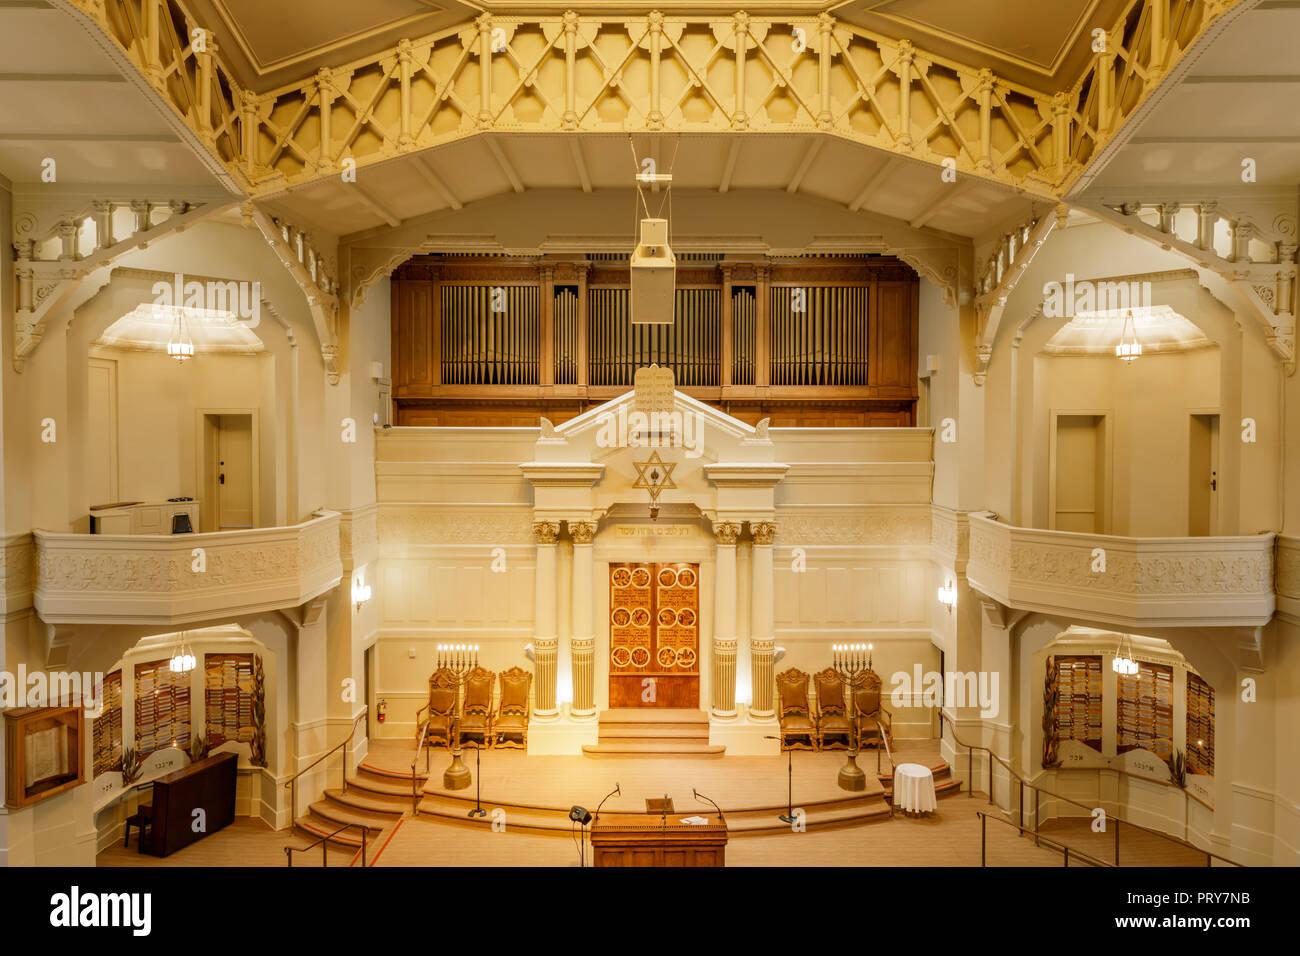 Oakland, California - September 30, 2018: Interior of Temple Sinai Reform Jewish Synagogue. - Stock Image